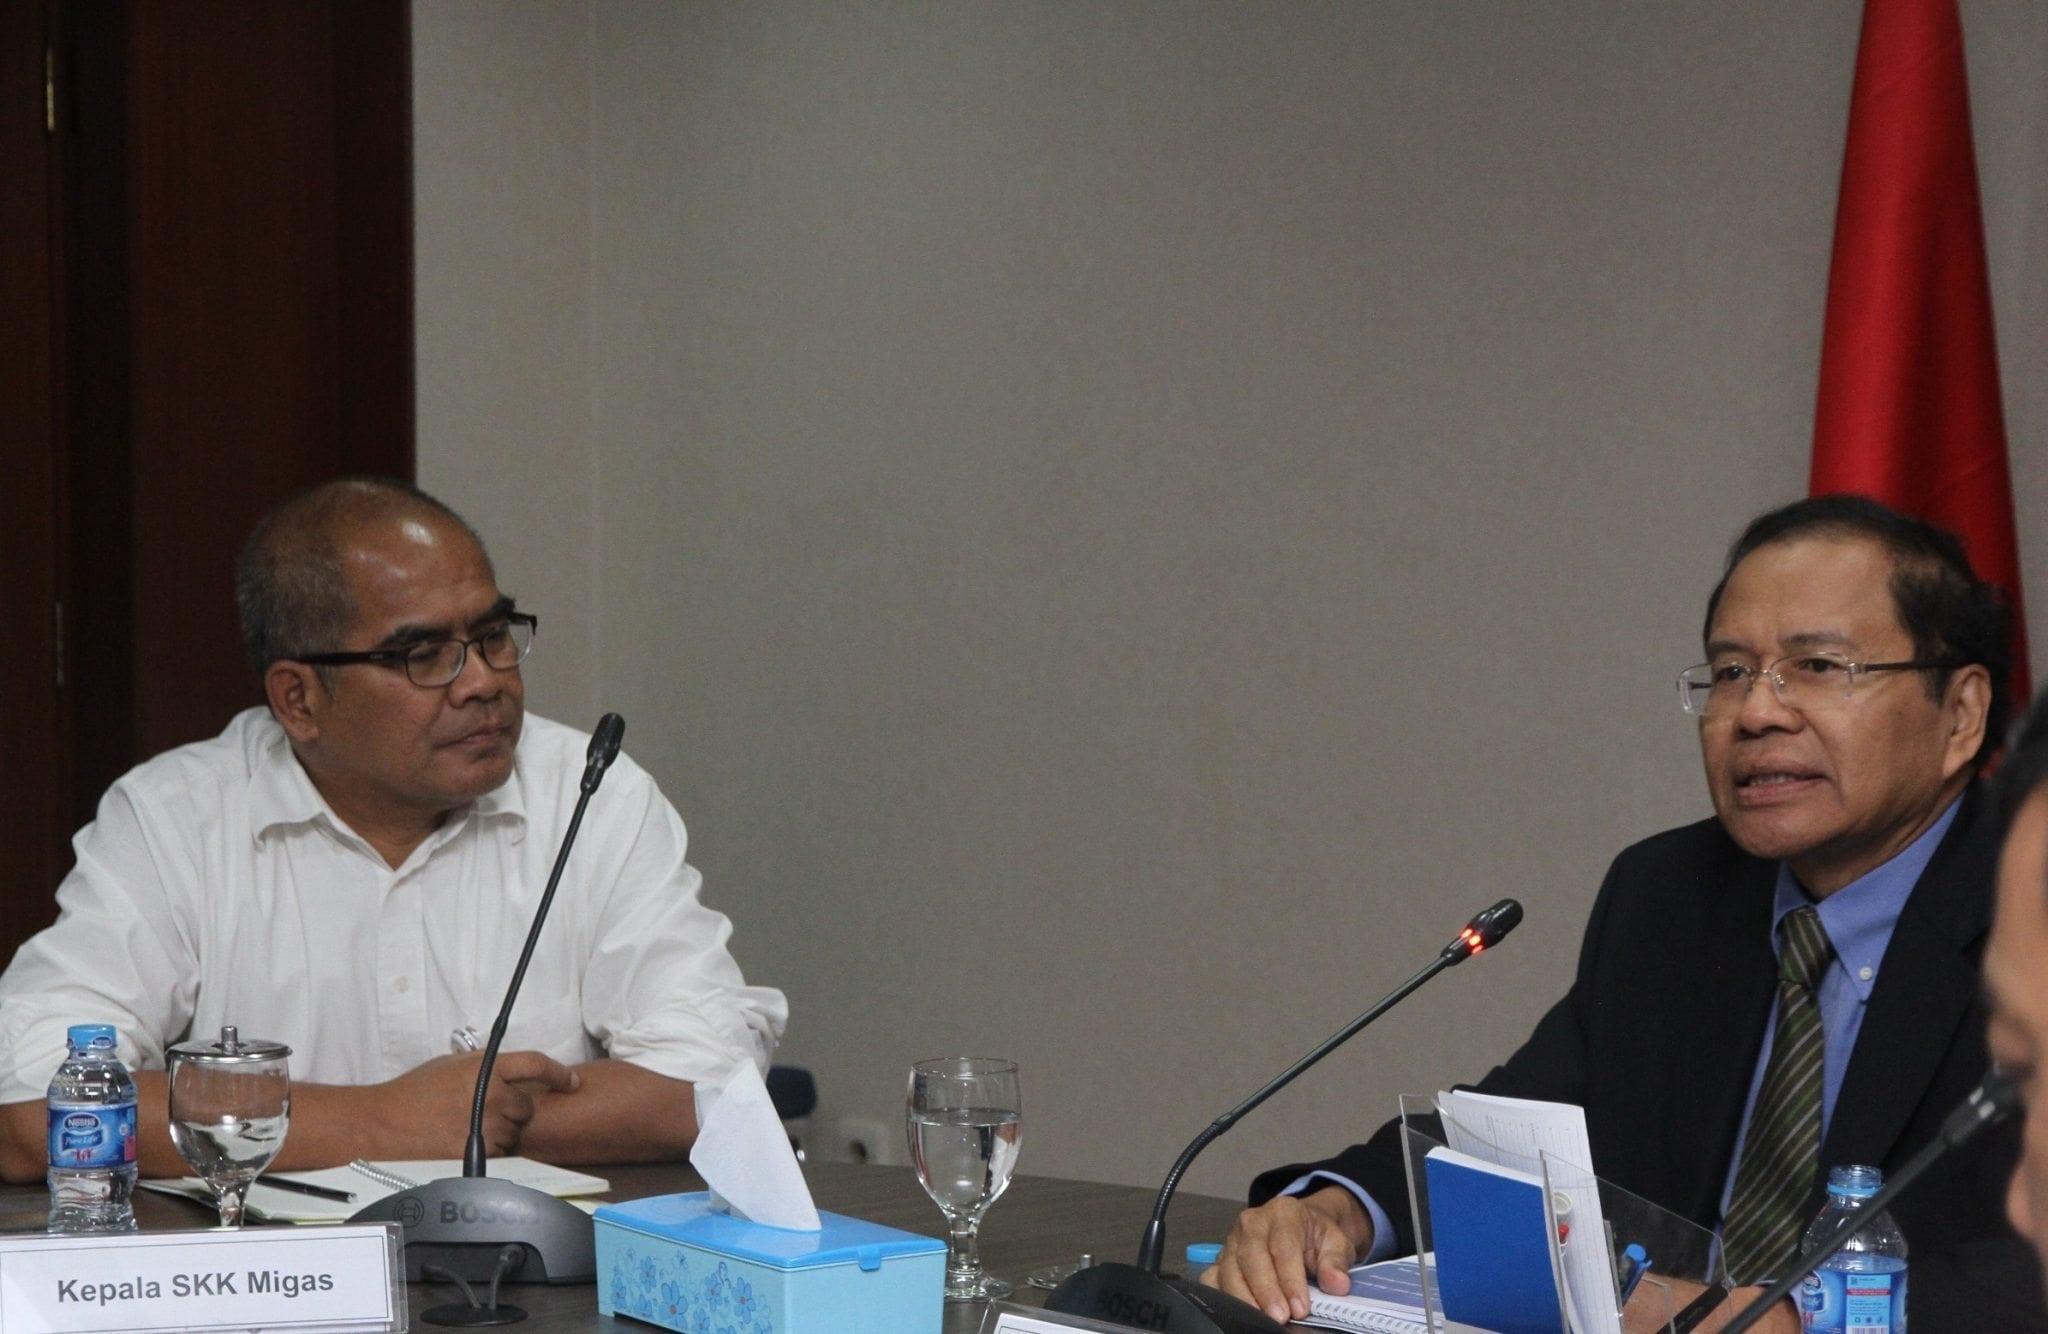 Keputusan Jokowi Soal Masela, Tonggak Perubahan Paradigma Pengelolaan SDA